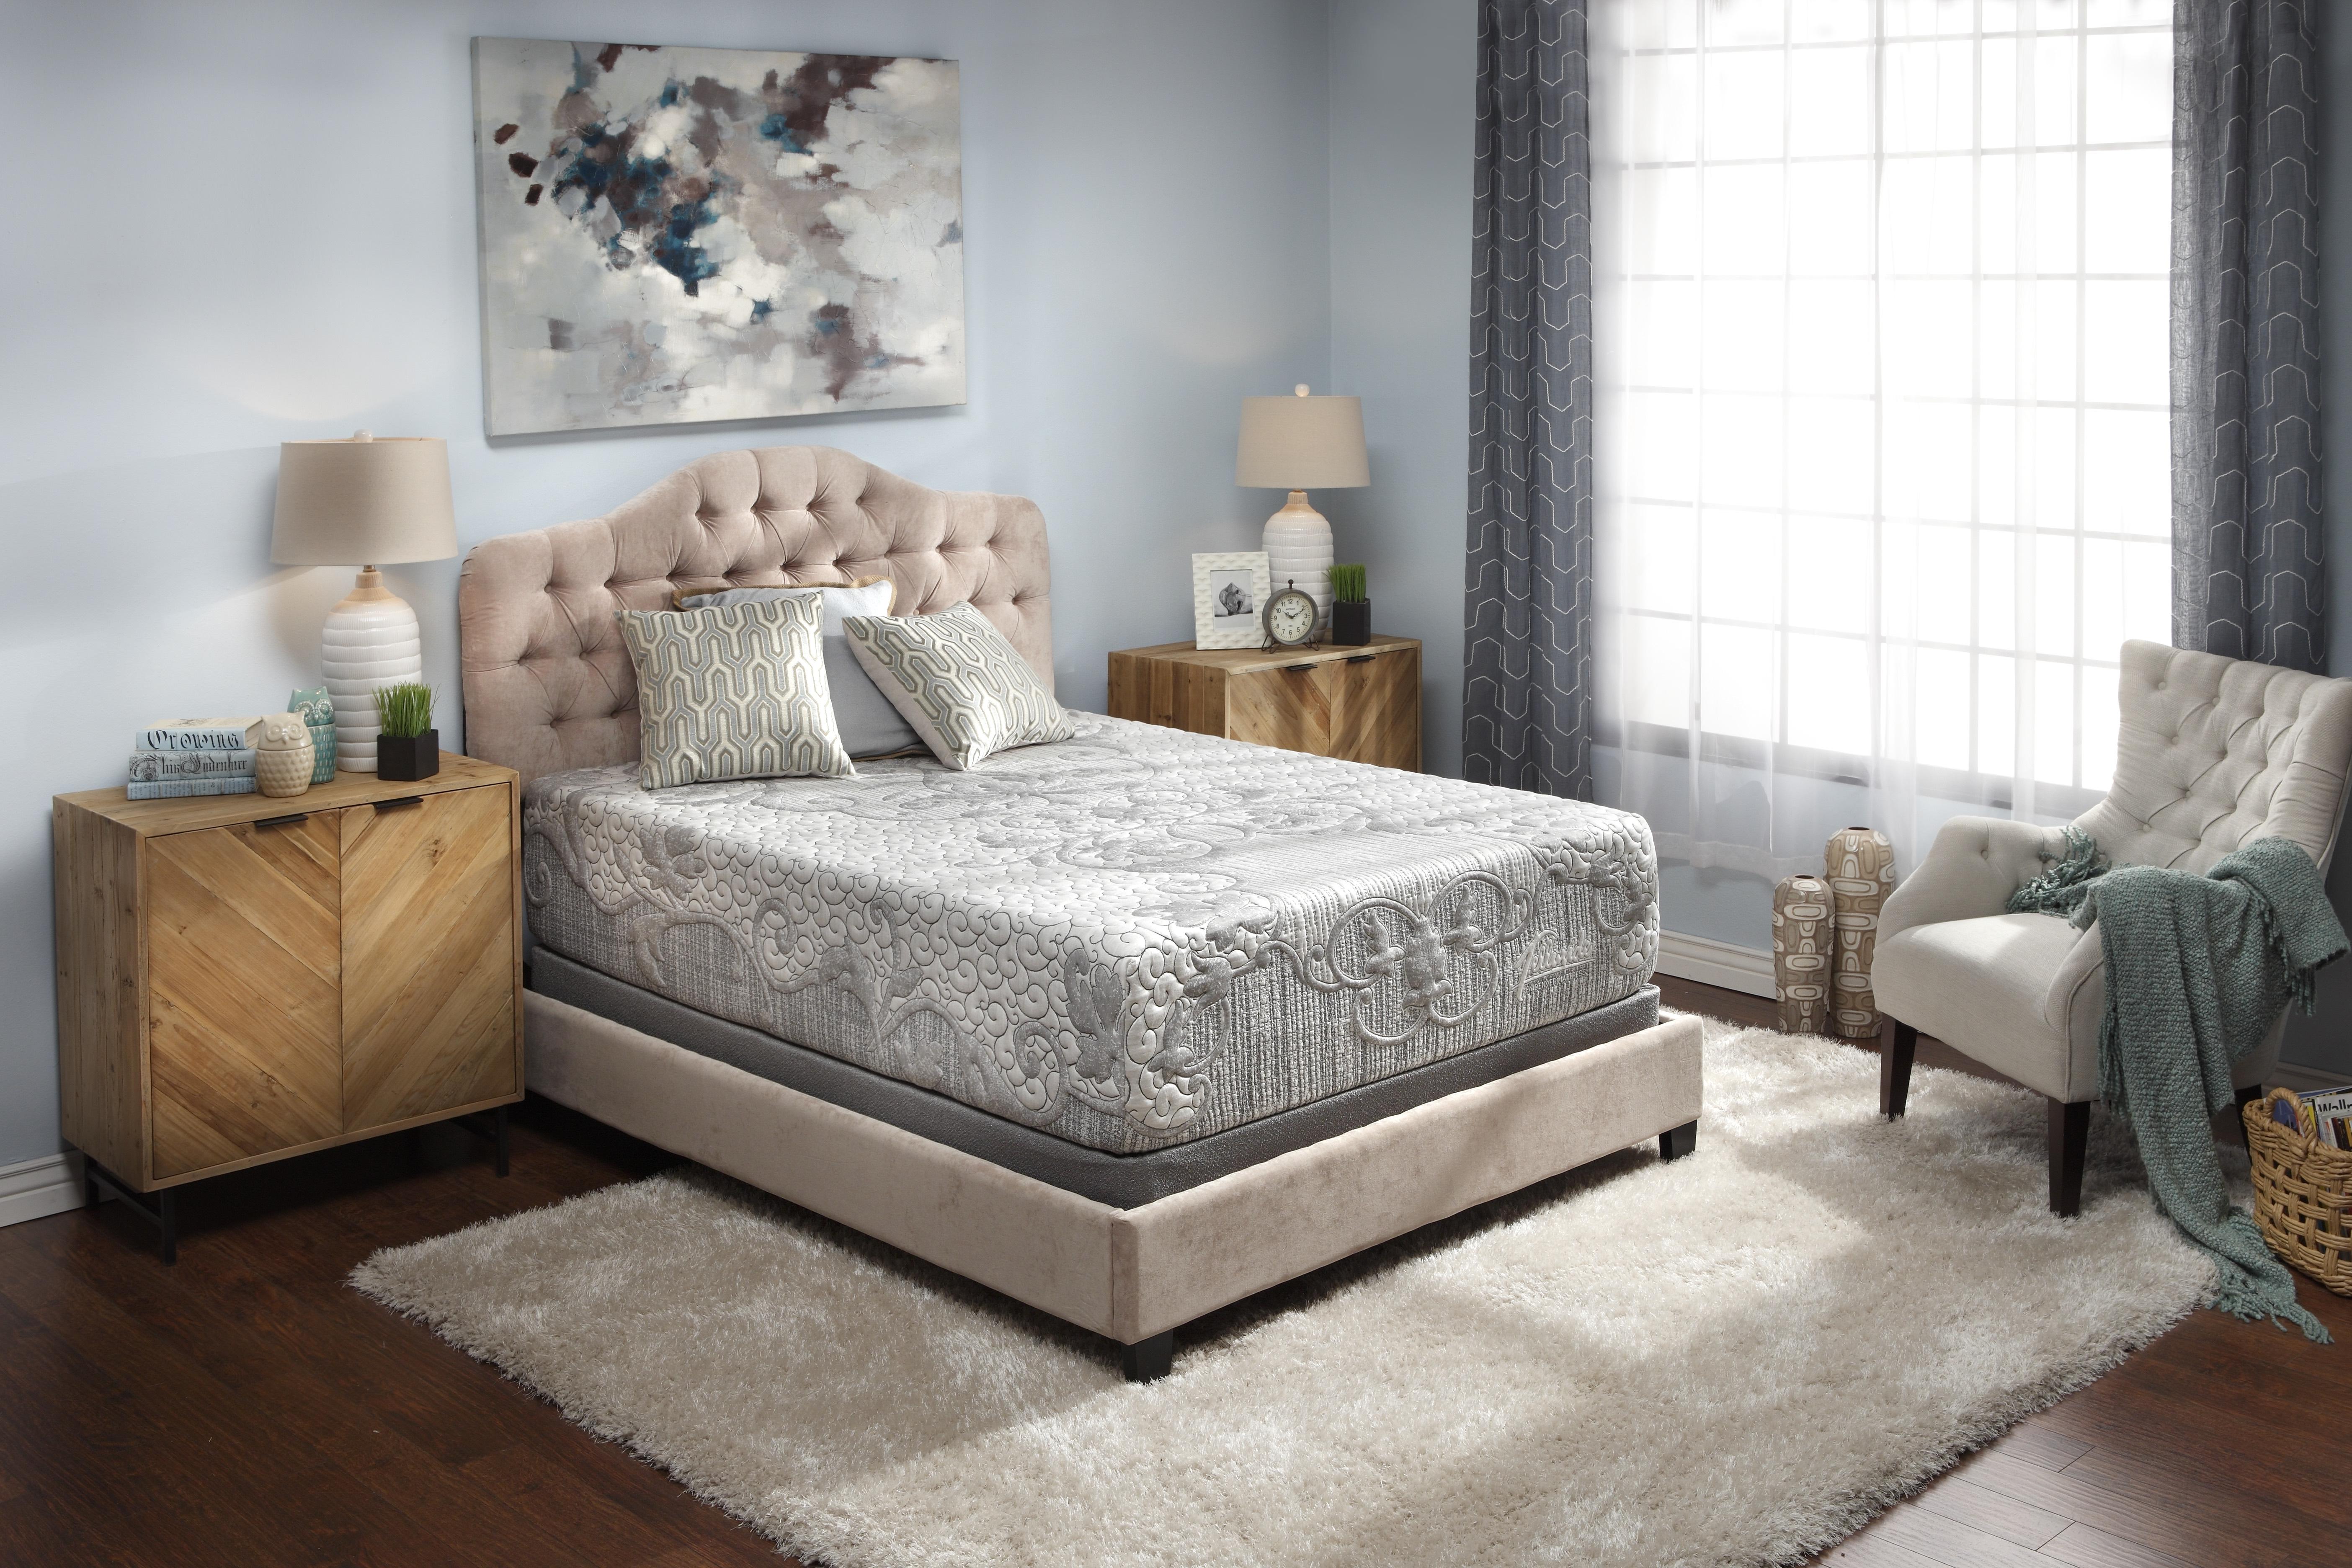 denver mattress company 5000 n 27th st lincoln ne 68521 yp com